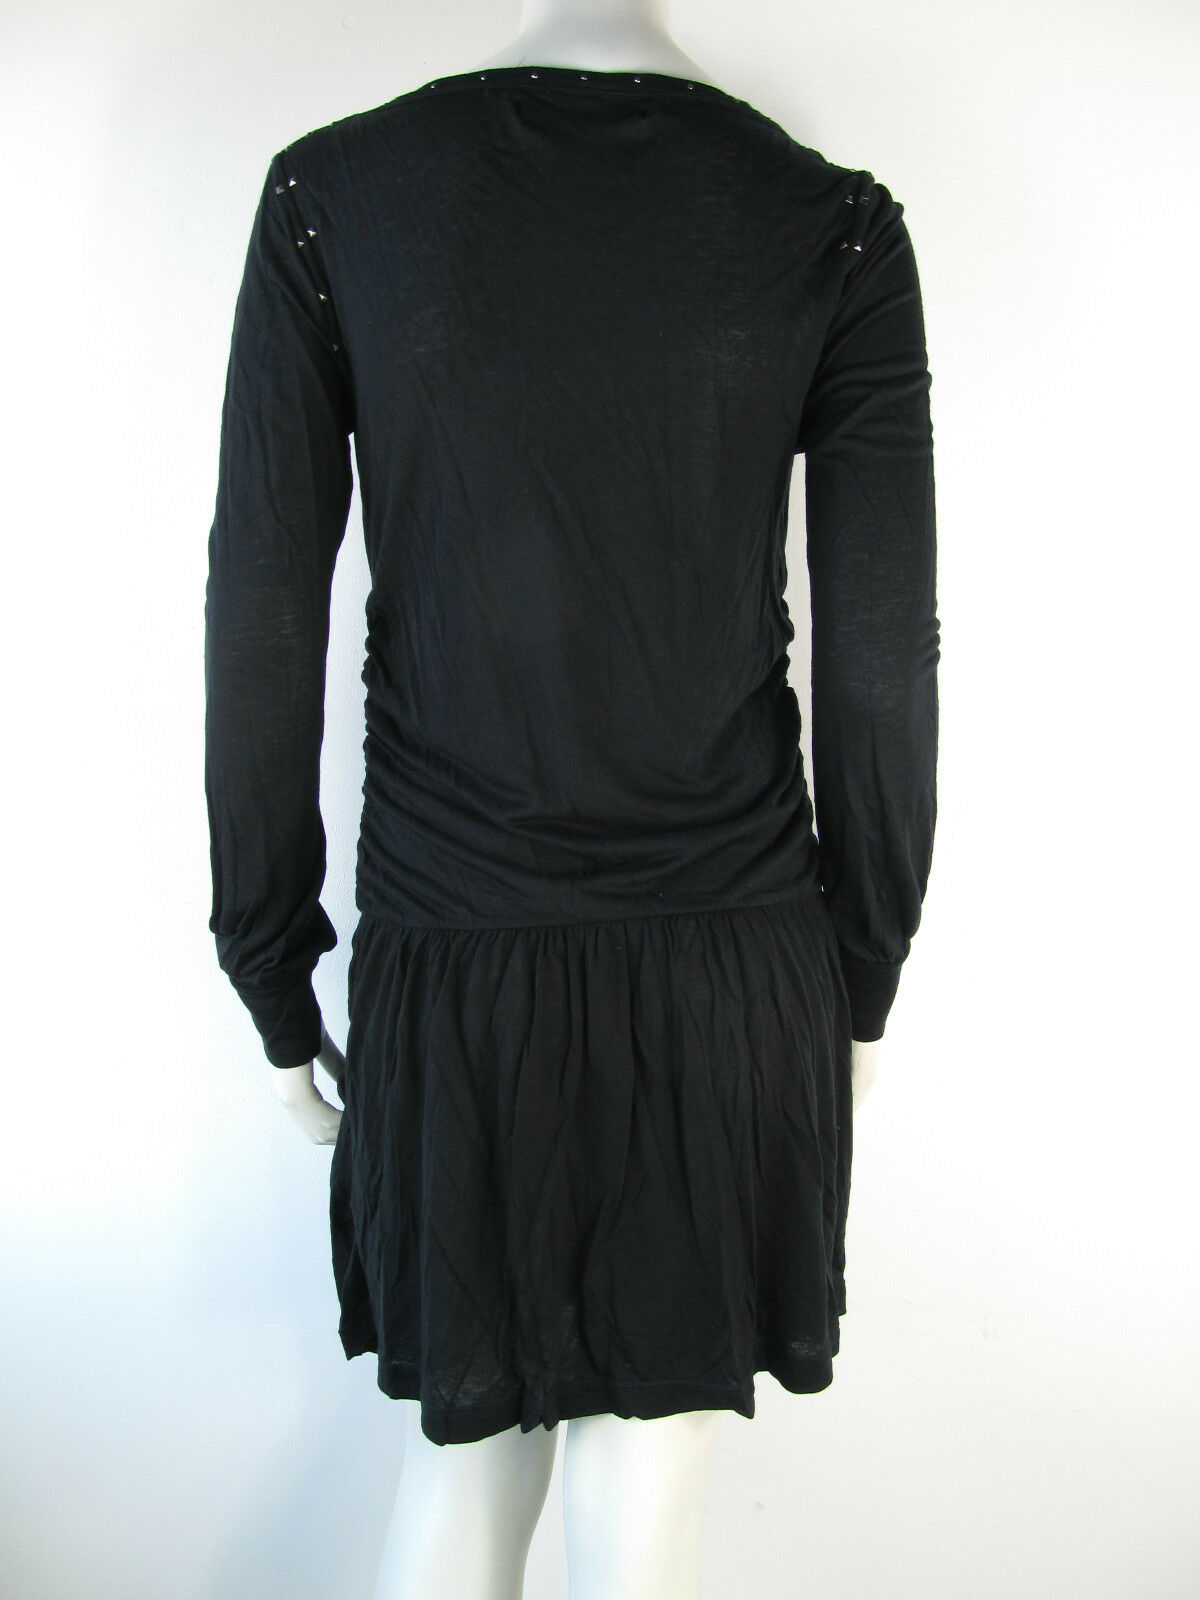 Replay Kleed Kleid Dress Jurk Jurk Jurk W9632 Nieten black Neu S be23f4